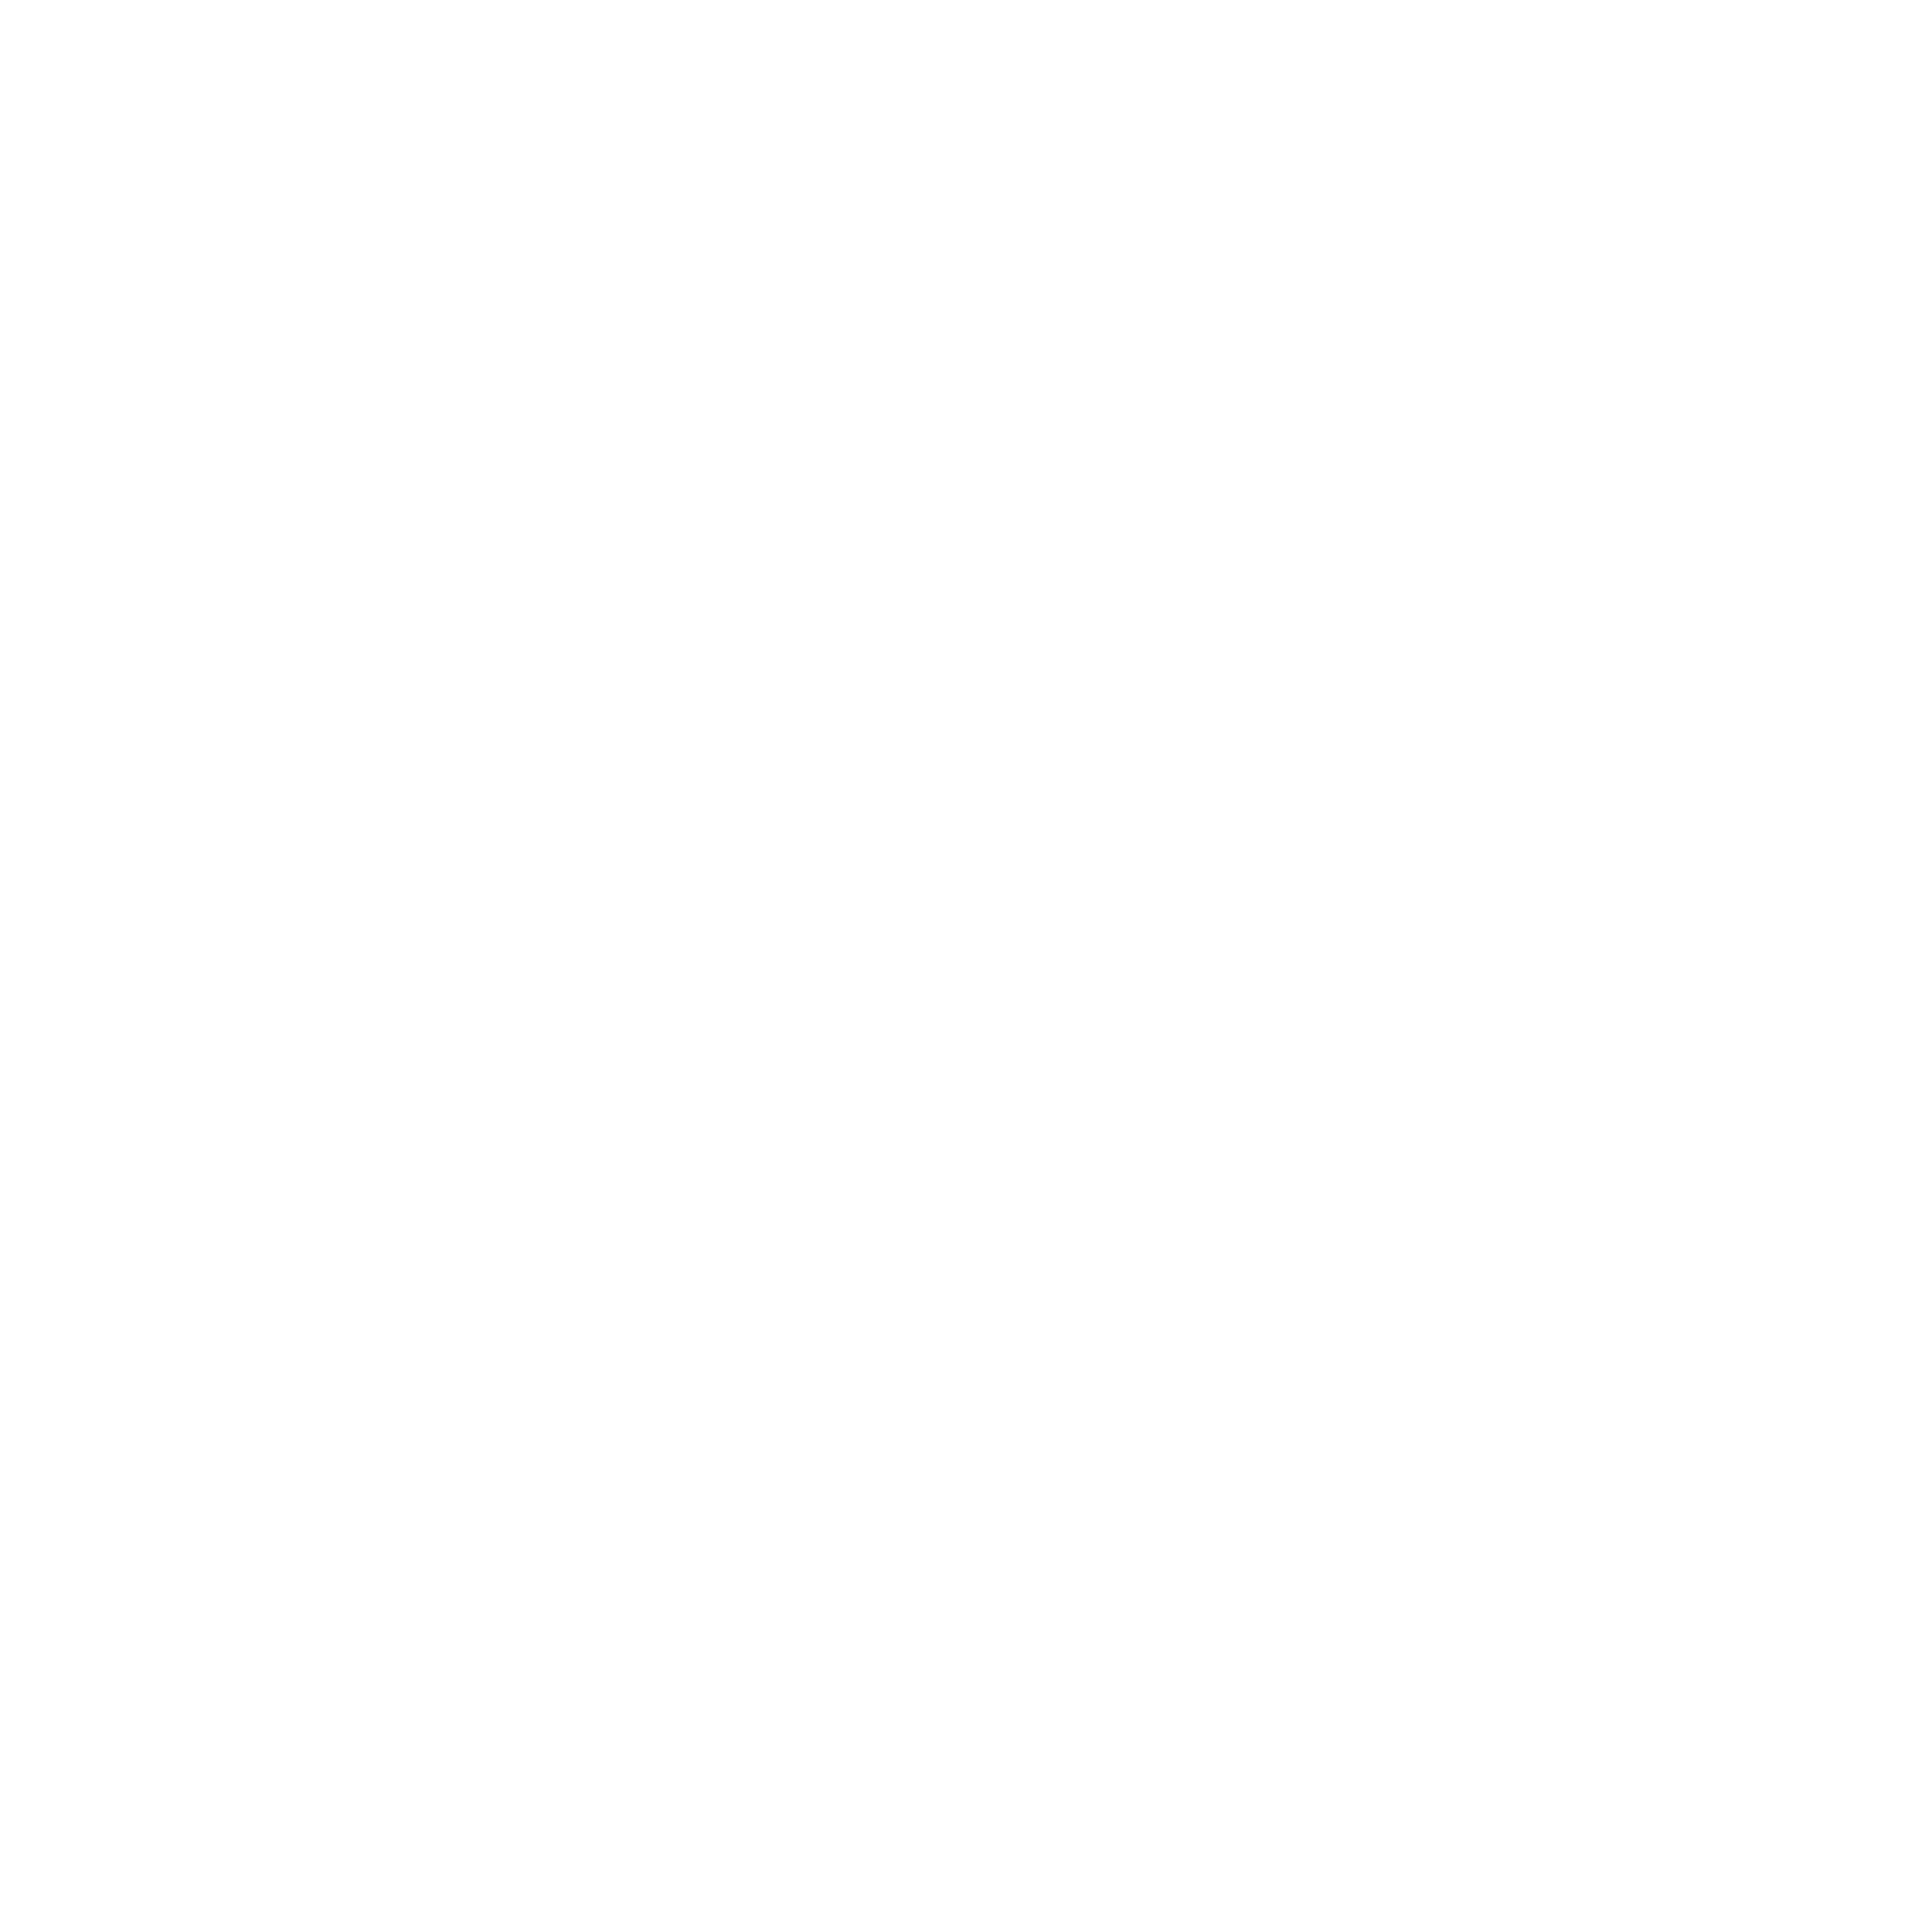 2000px-Transparent_square.svg.png